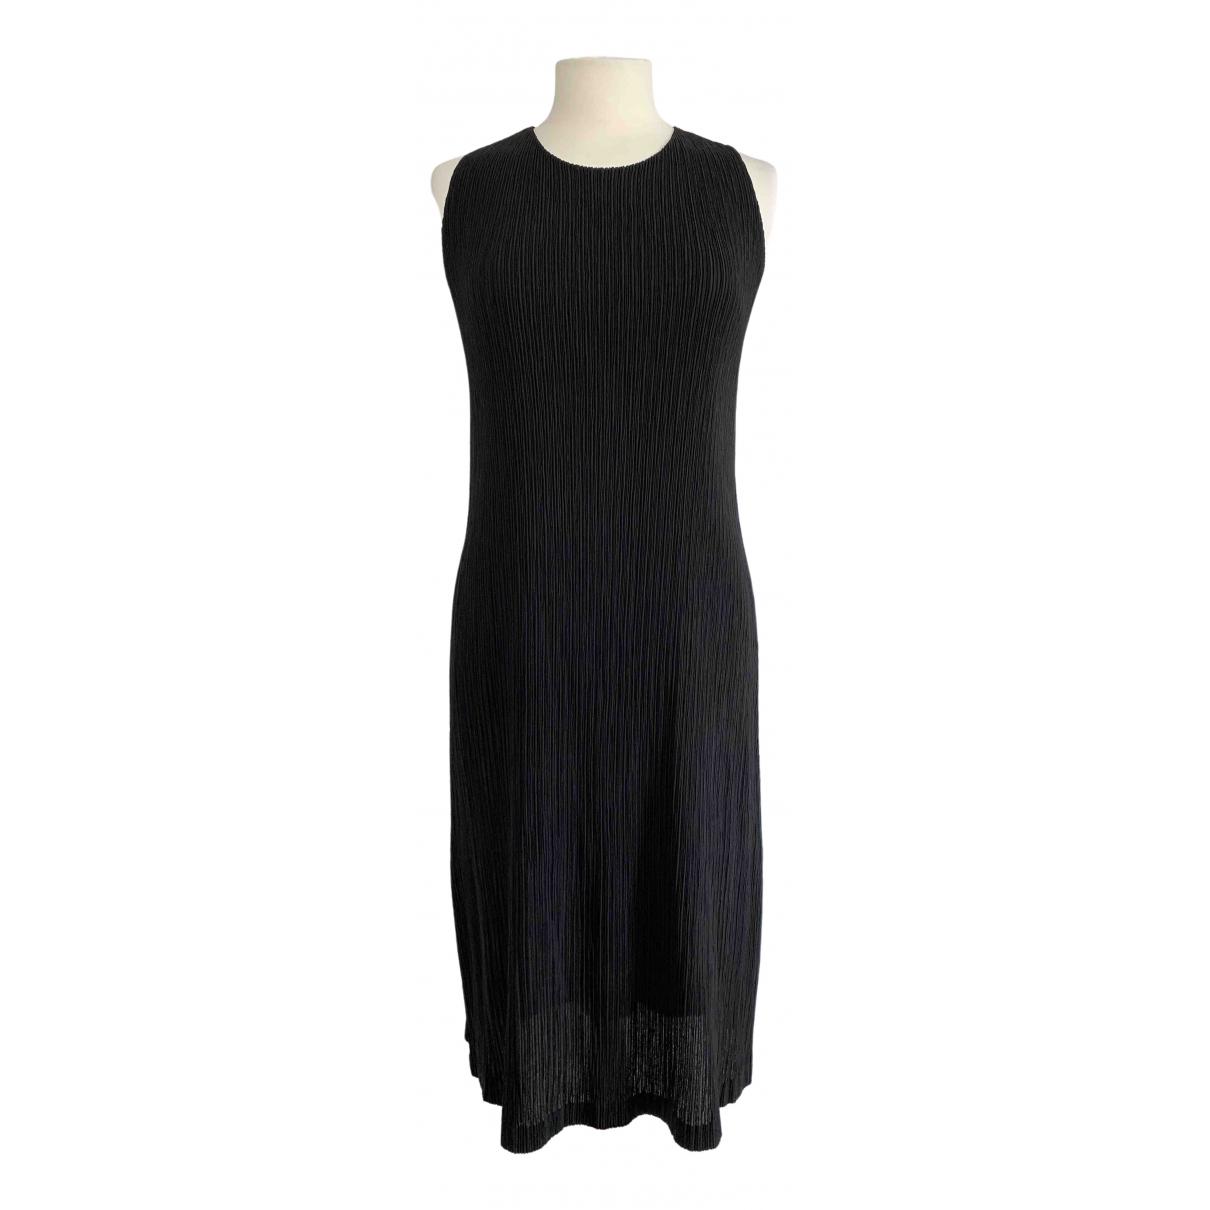 Issey Miyake \N Black dress for Women 2 0-5